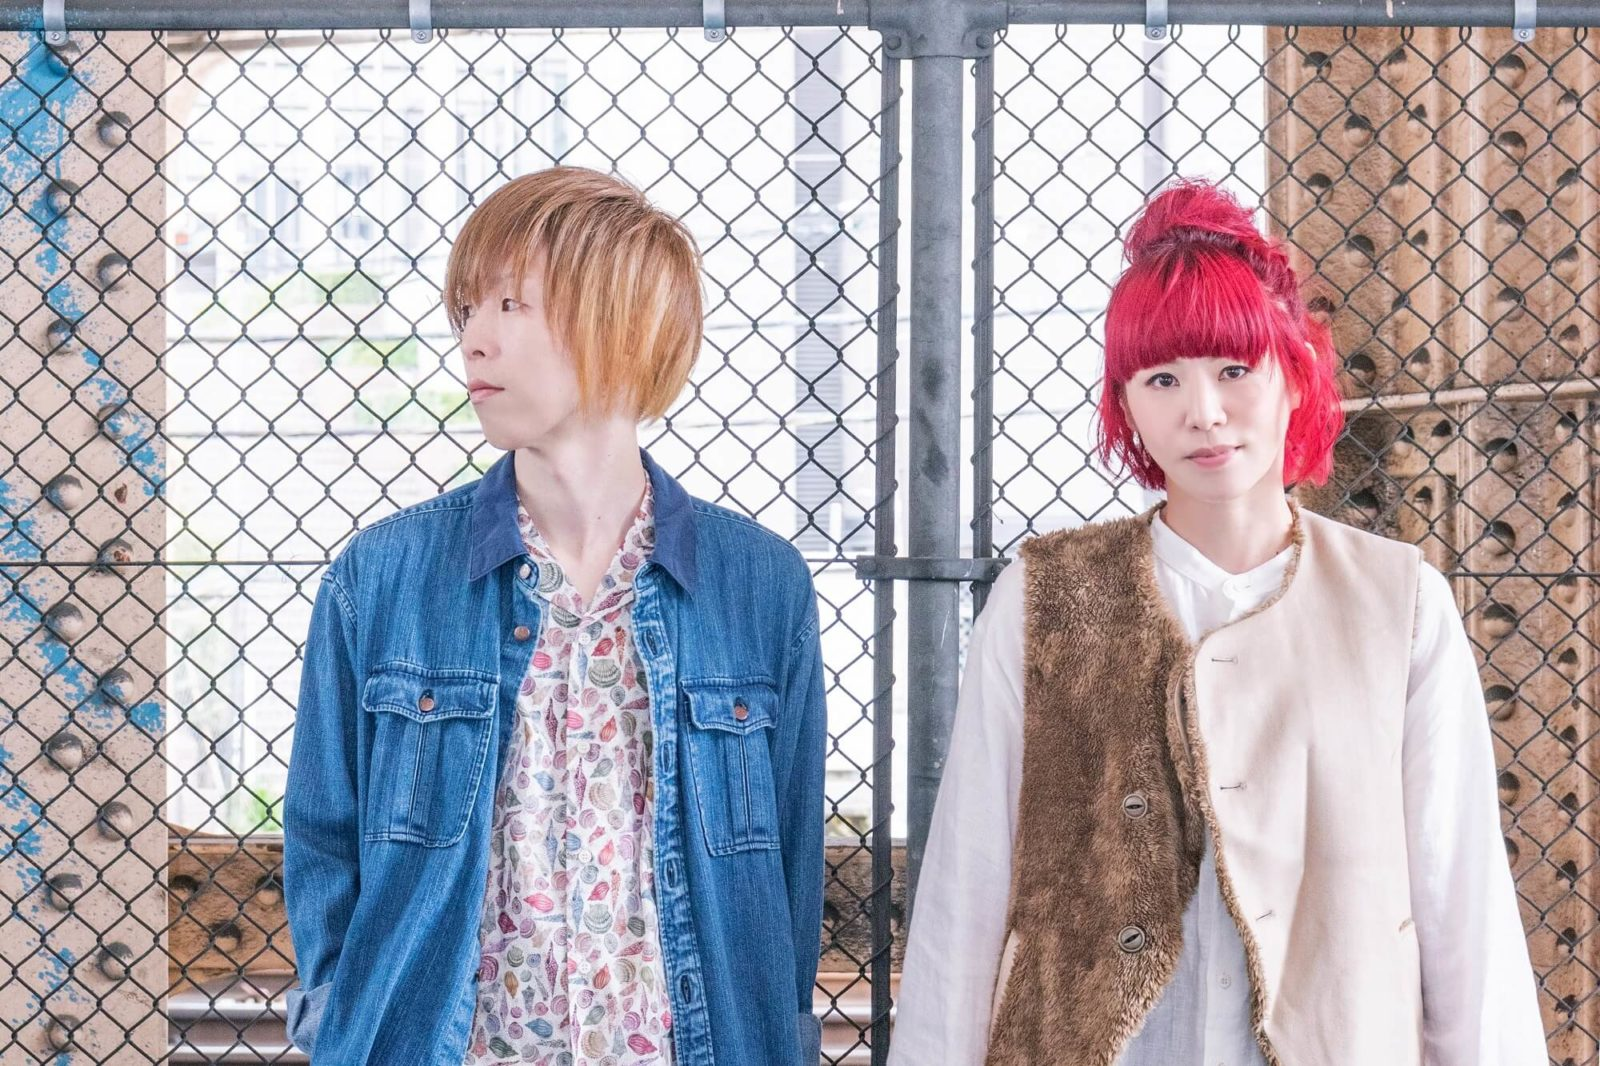 nano.RIPE、NHKみんなのうた「ヨルガオ」のシングルリリースが8月21日に決定サムネイル画像